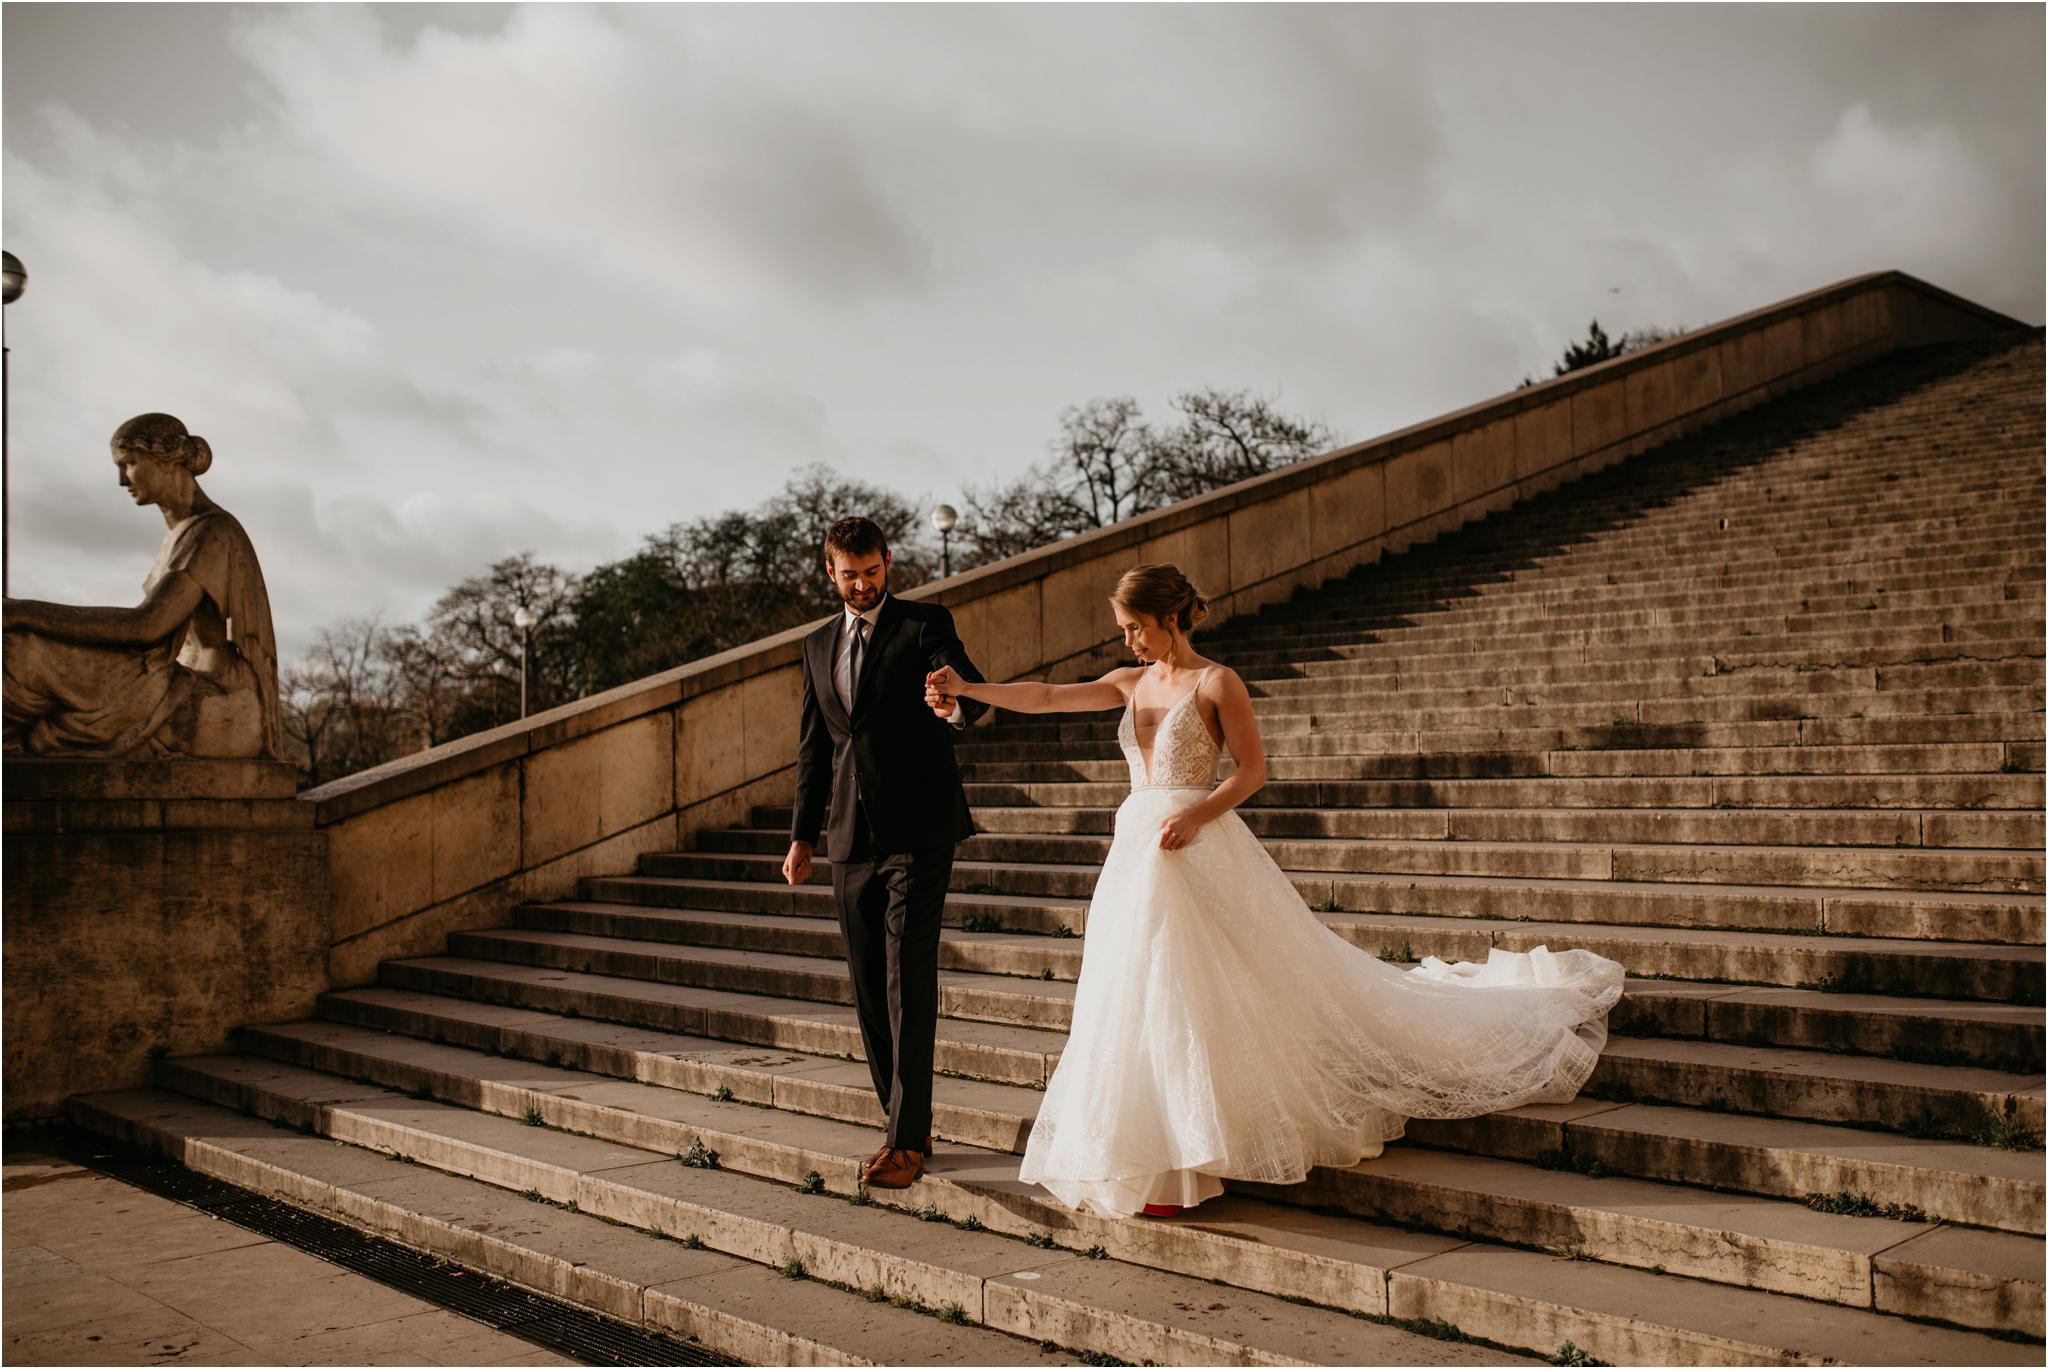 miranda-and-jared-paris-elopement-destination-wedding-photographer-072.jpg